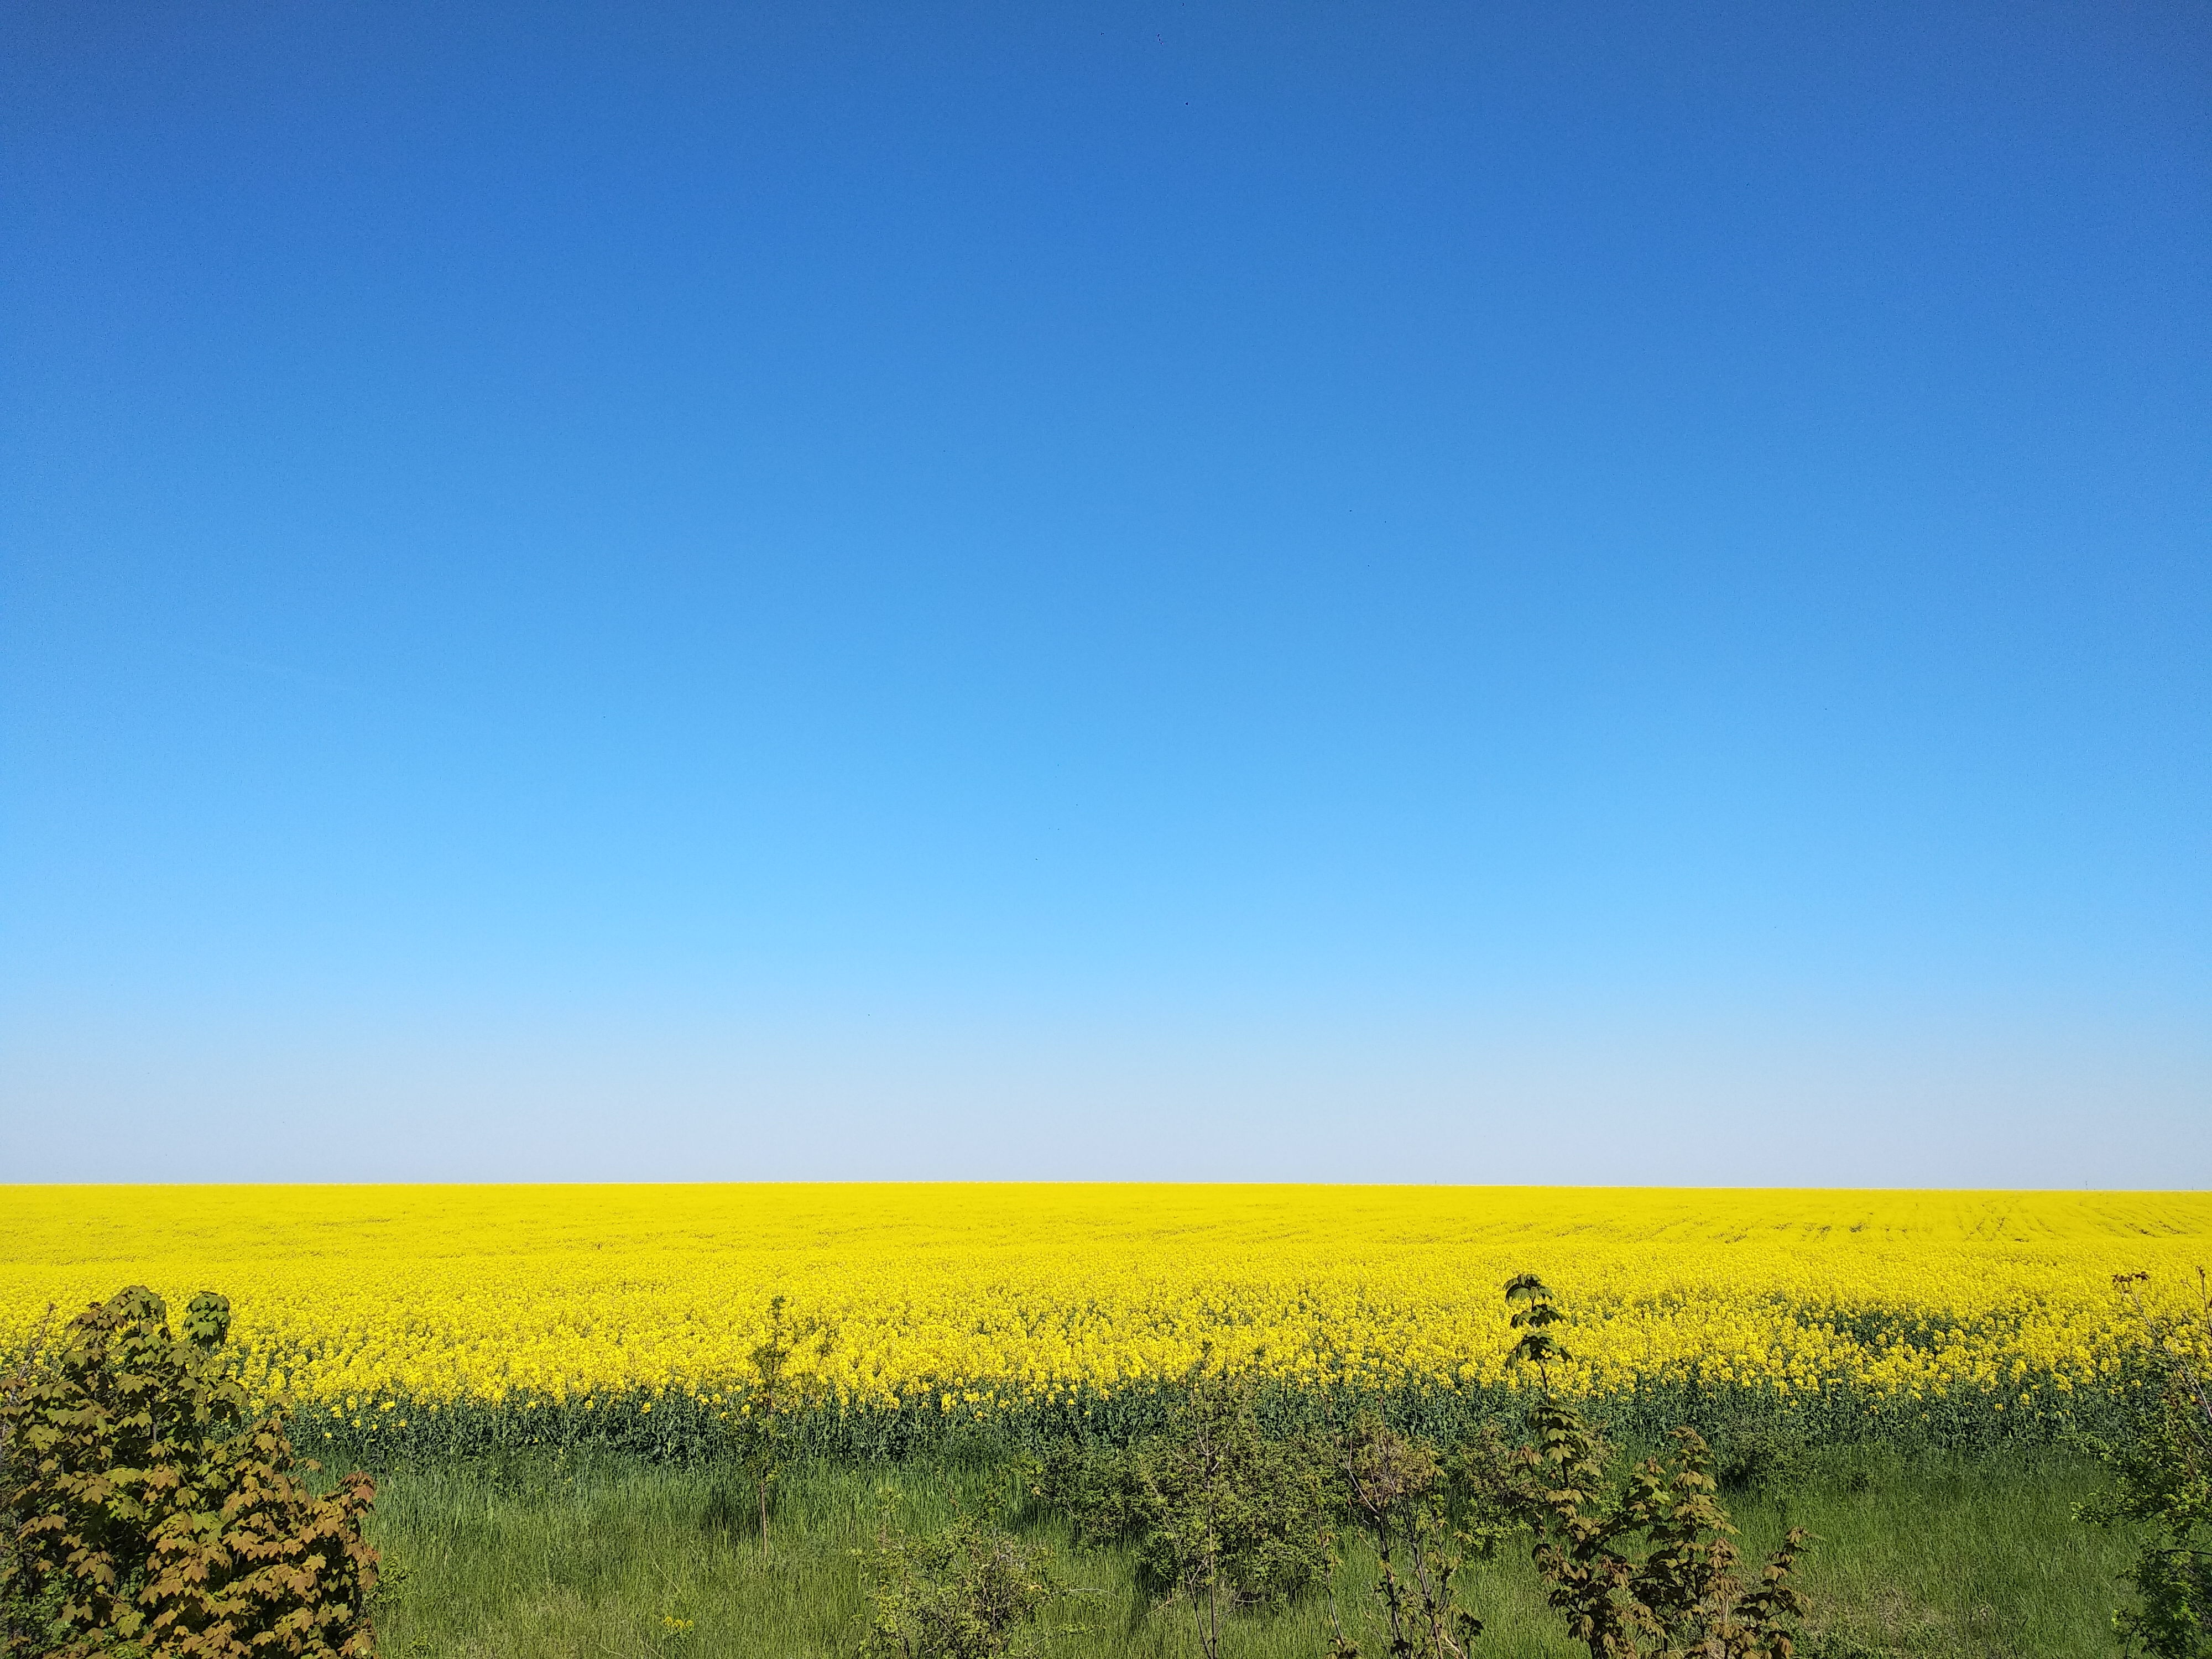 Рапсовые поля Украины. Солнце на земле ☀️🌿